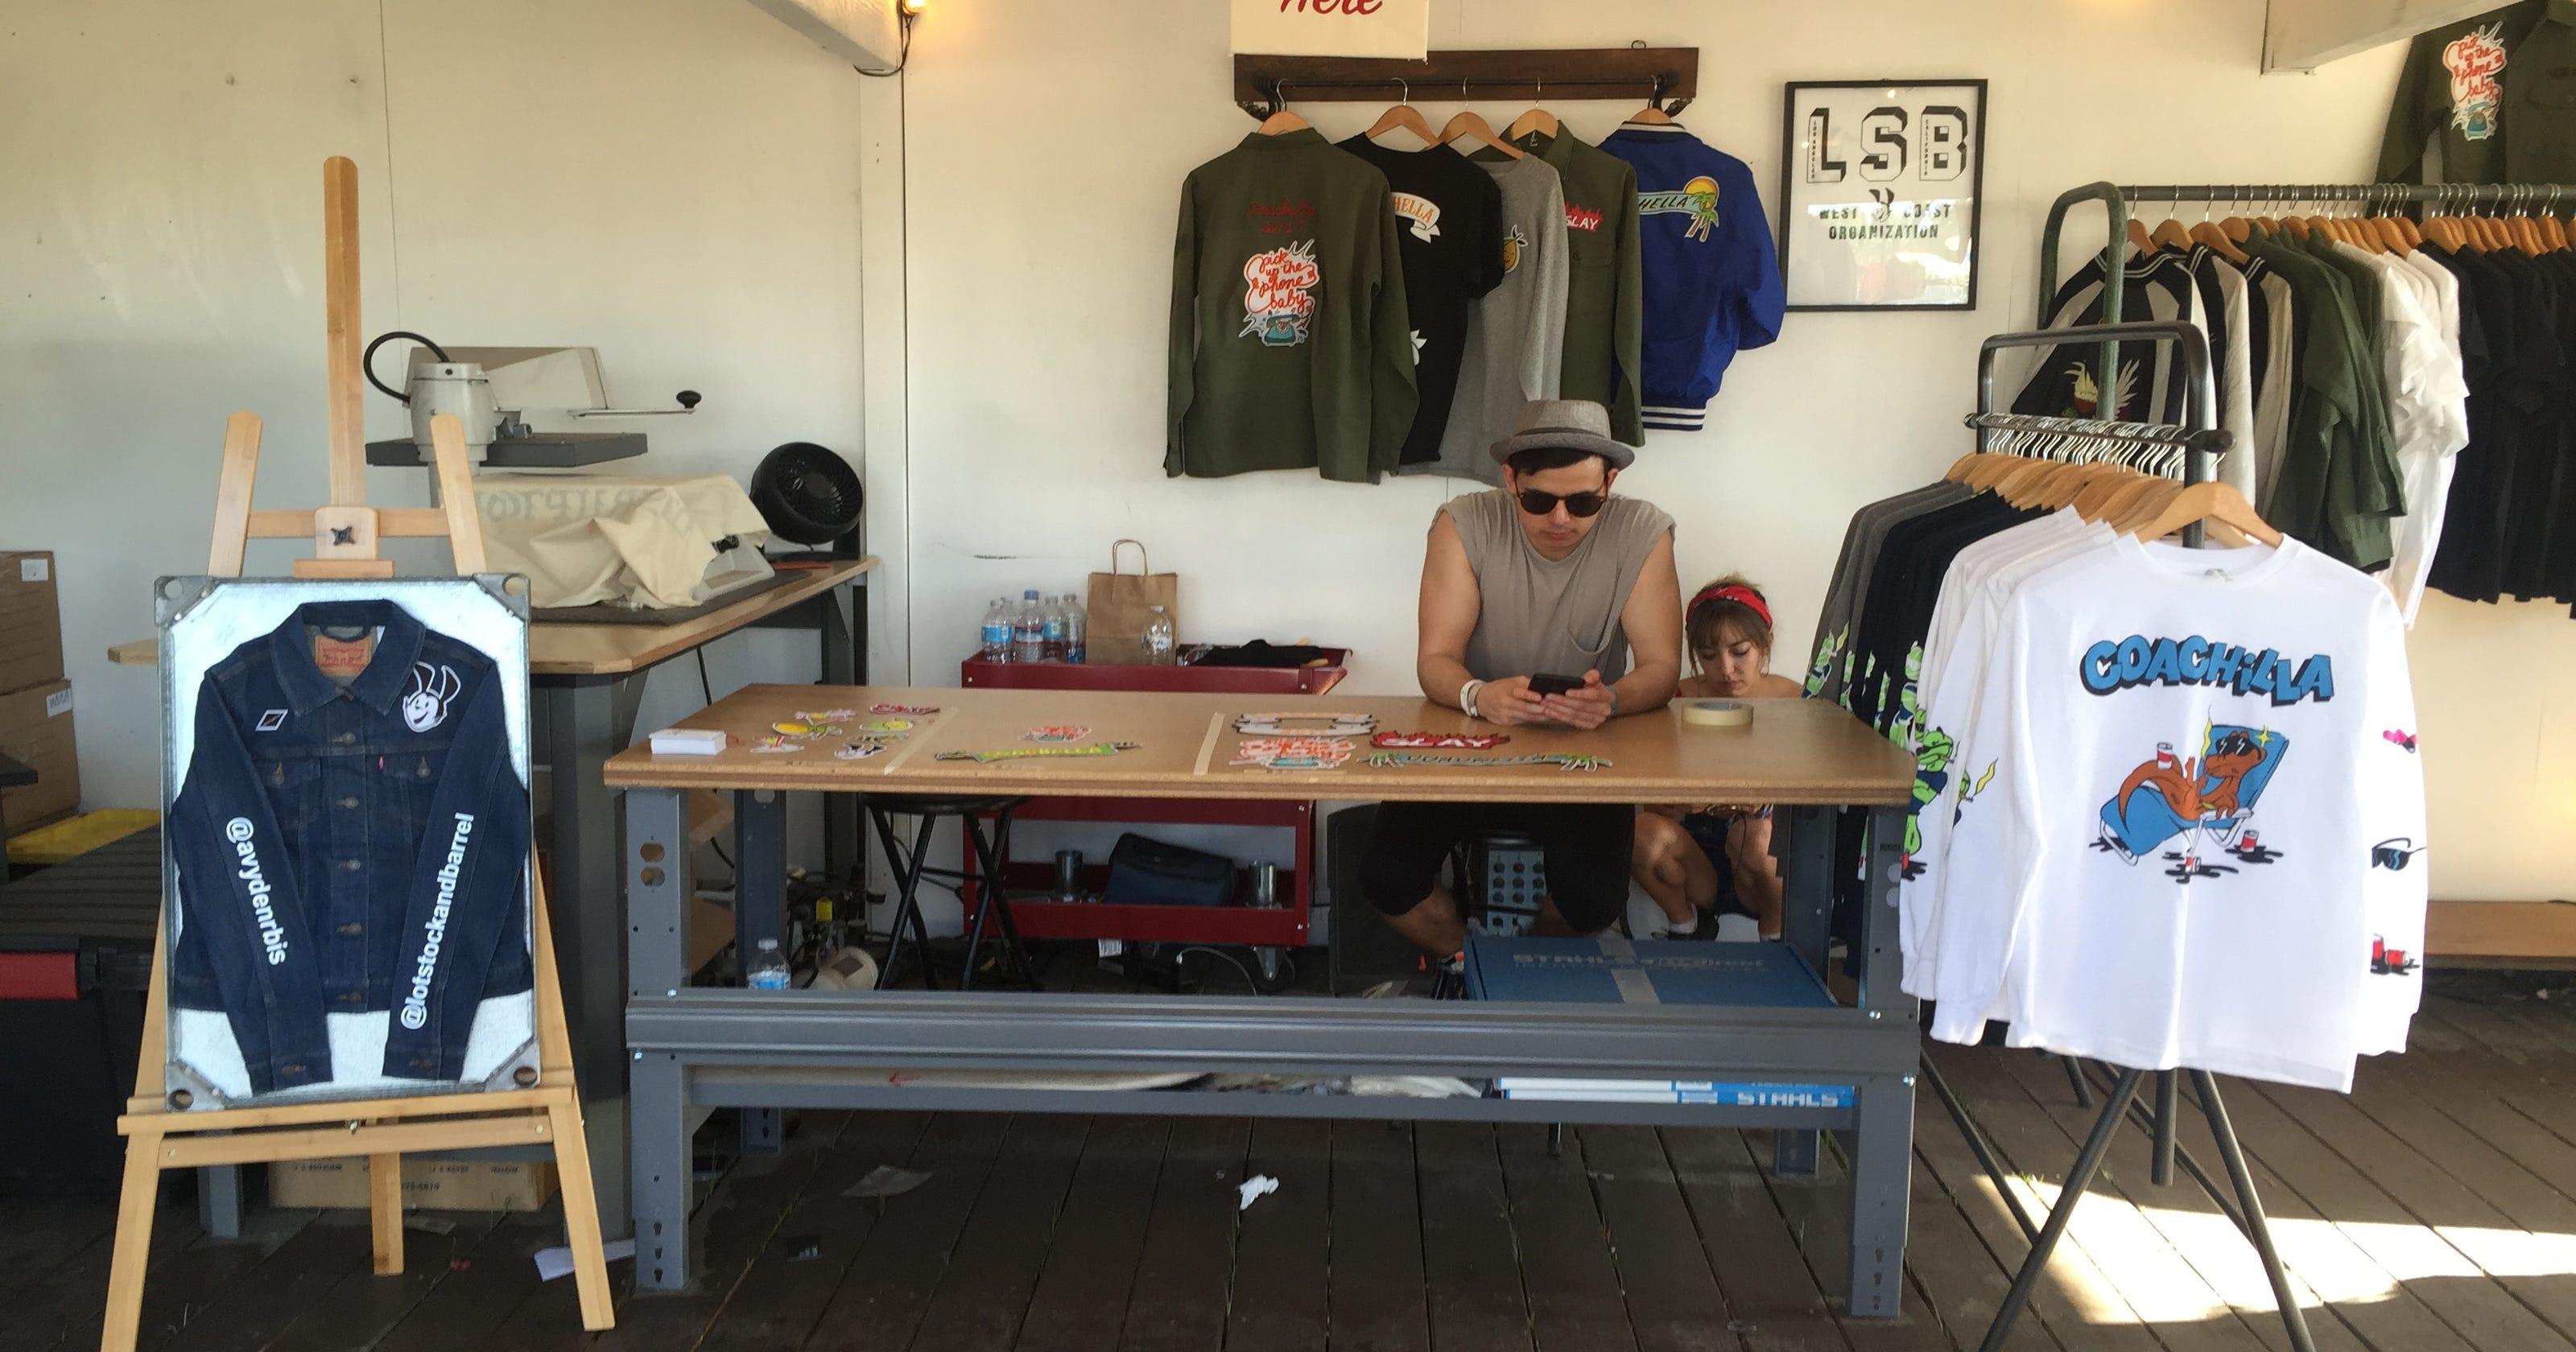 f2fd146cde564d Festival-goers customize Coachella swag at pop-up shop